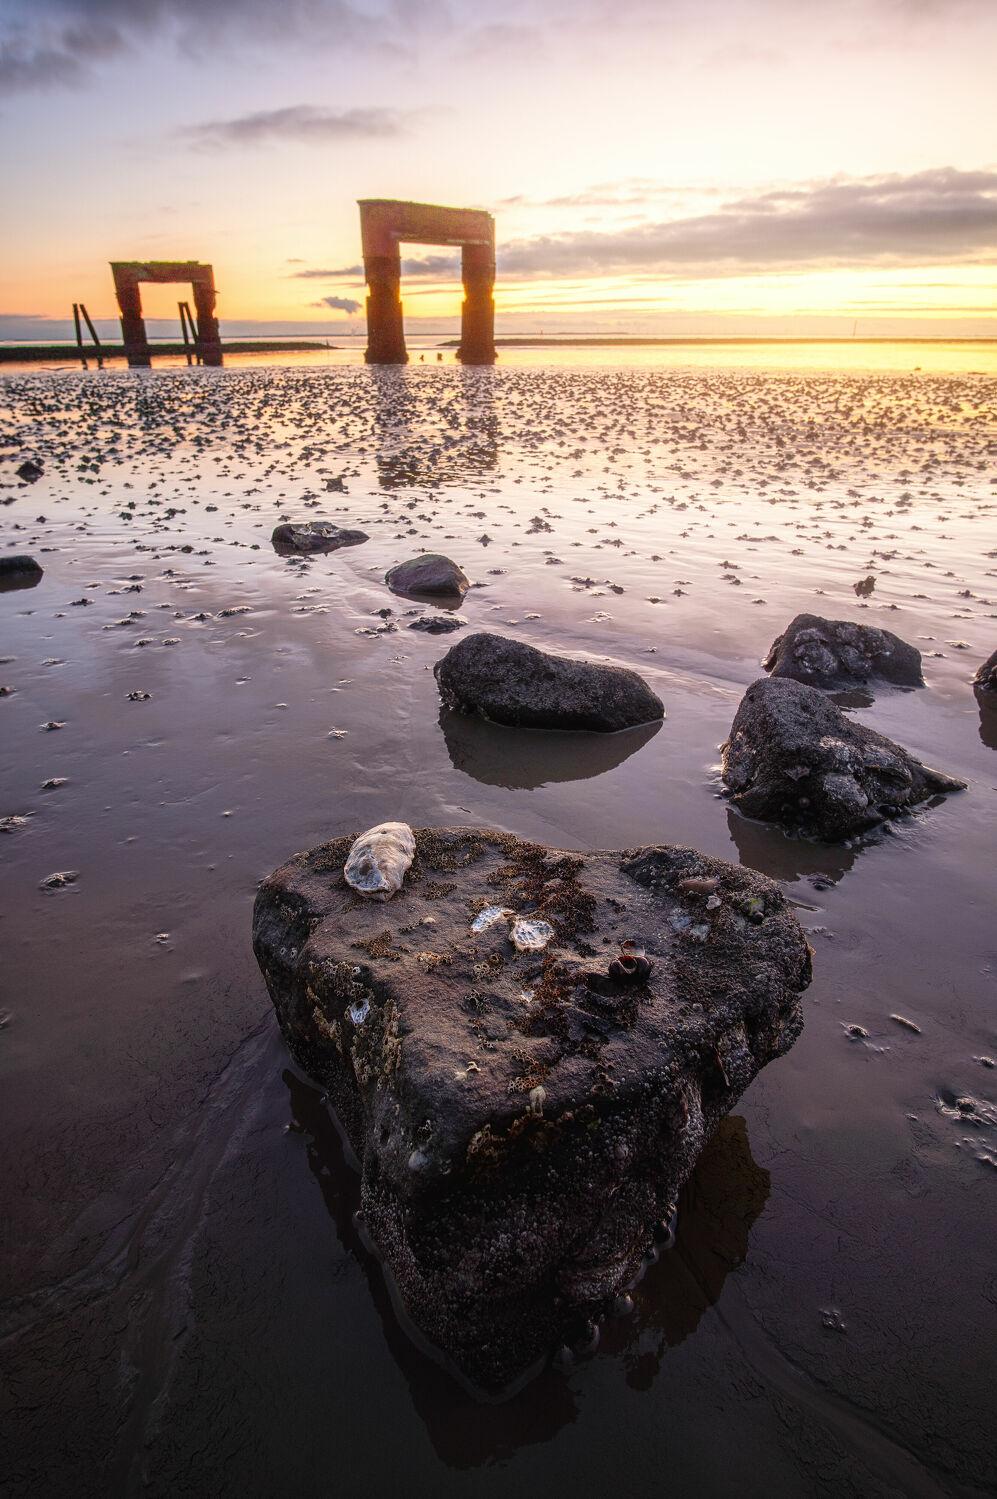 Bild mit Himmel, Meere, Stein, Landschaft, Nordsee, Muschel, Küste, Wattenmeer, Gezeiten, Niedersachsen